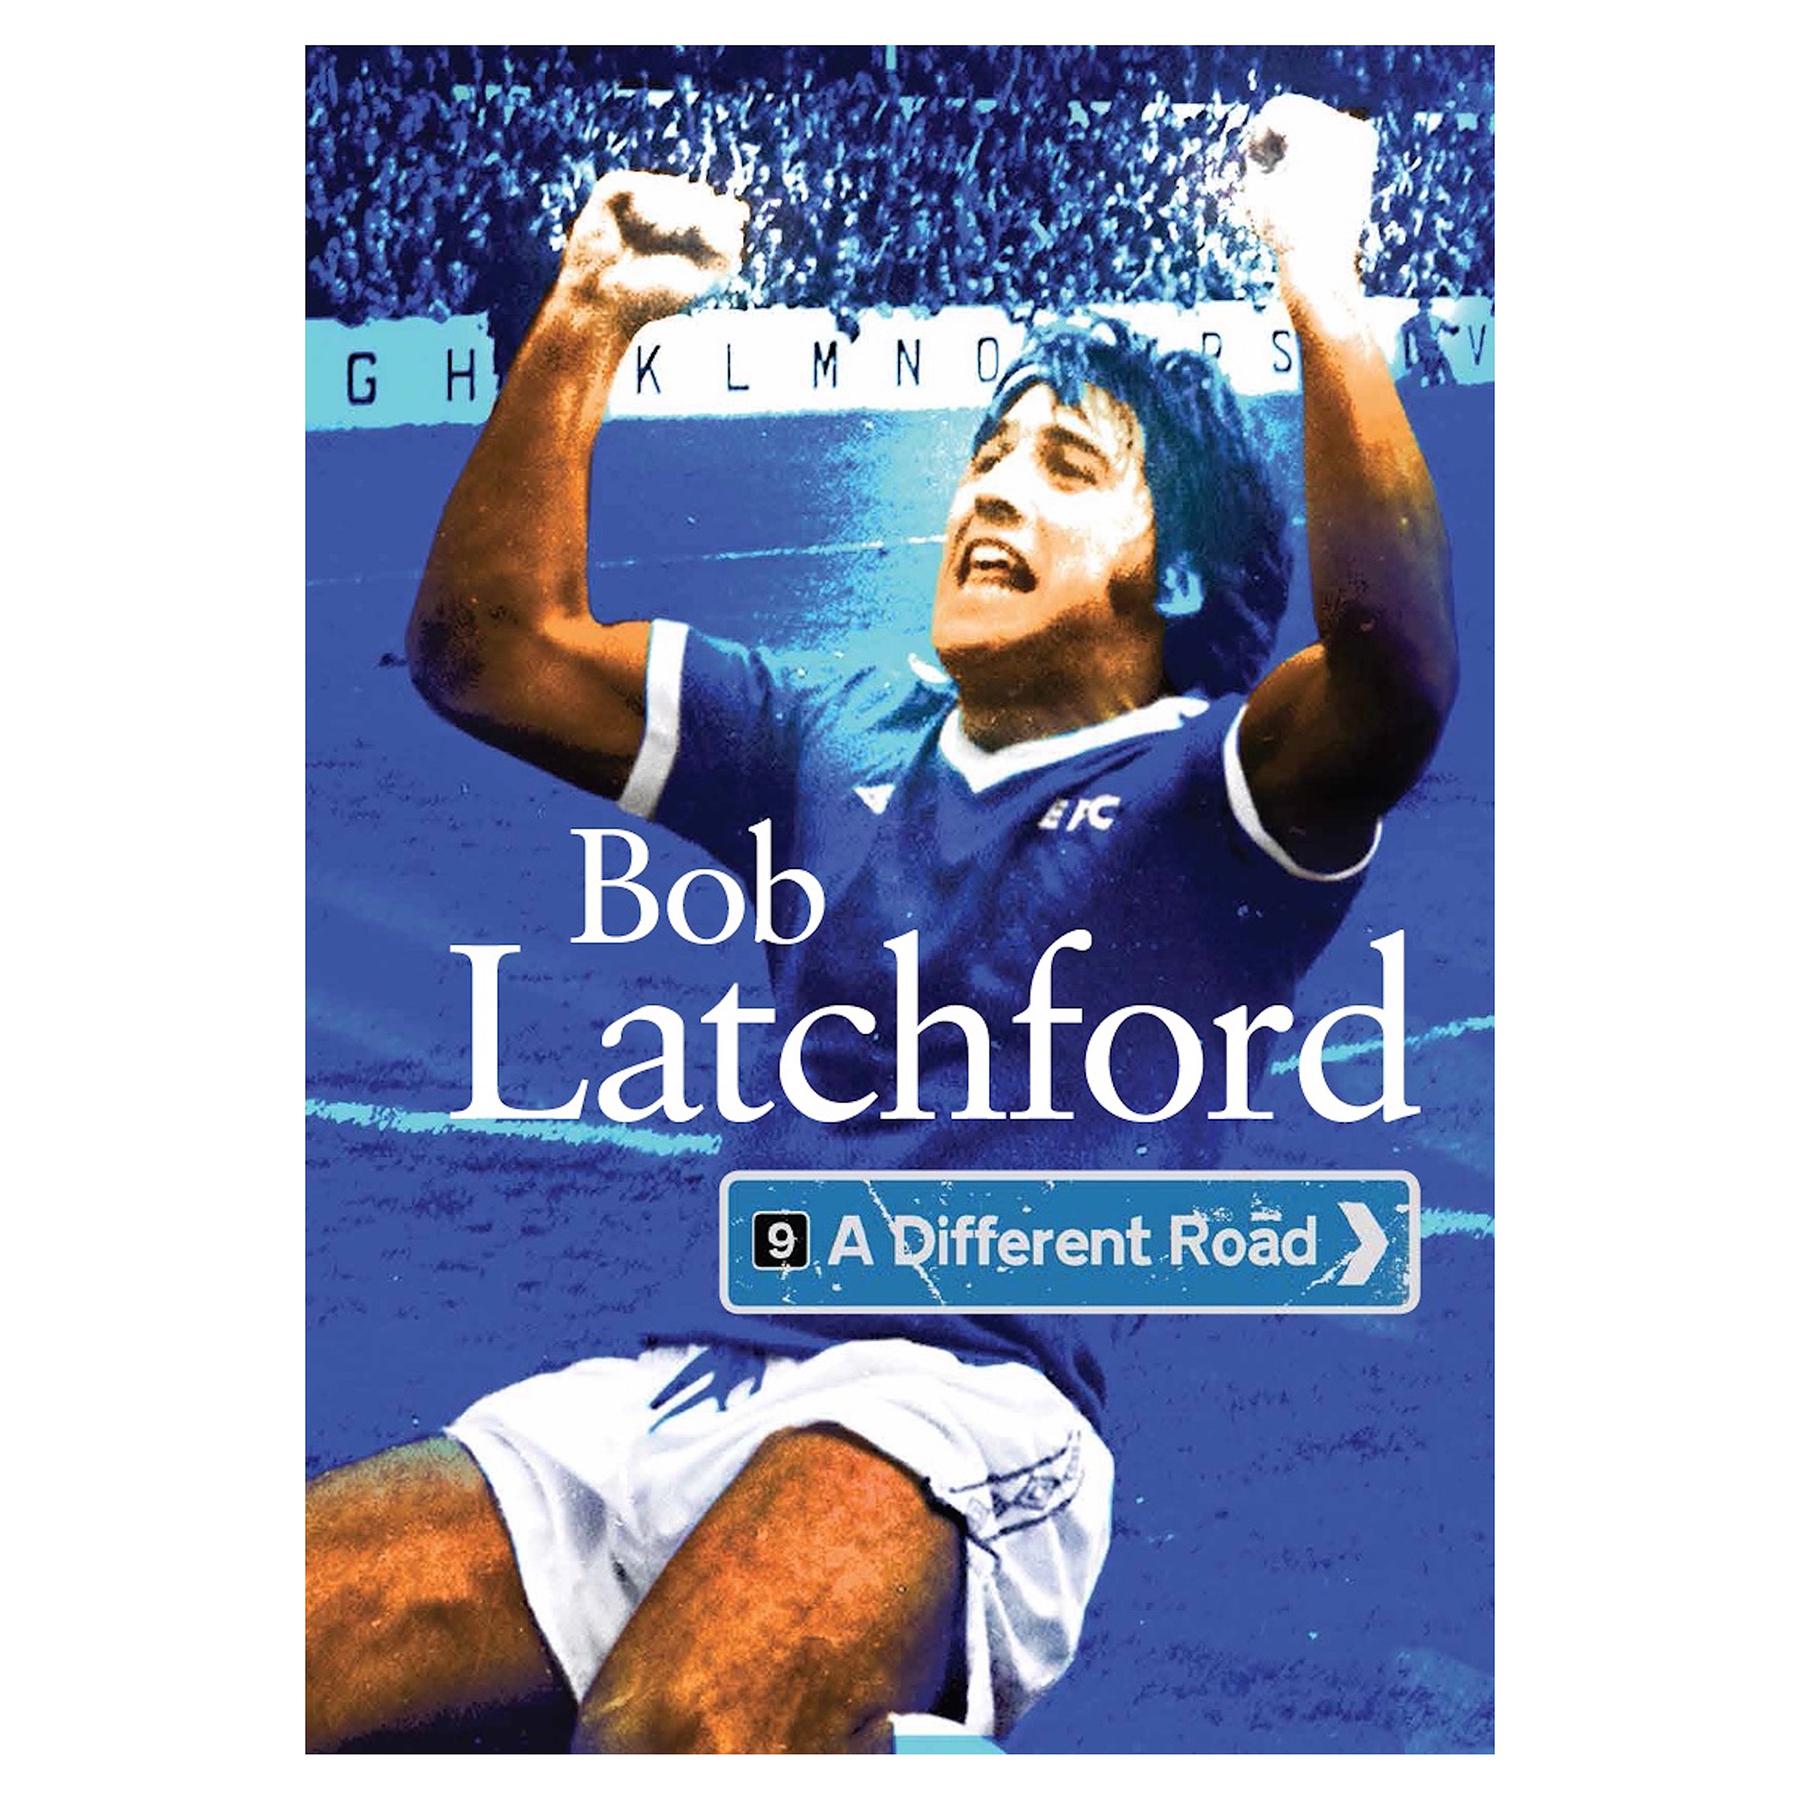 Everton Bob Latchford - A Different Road Hardback Book